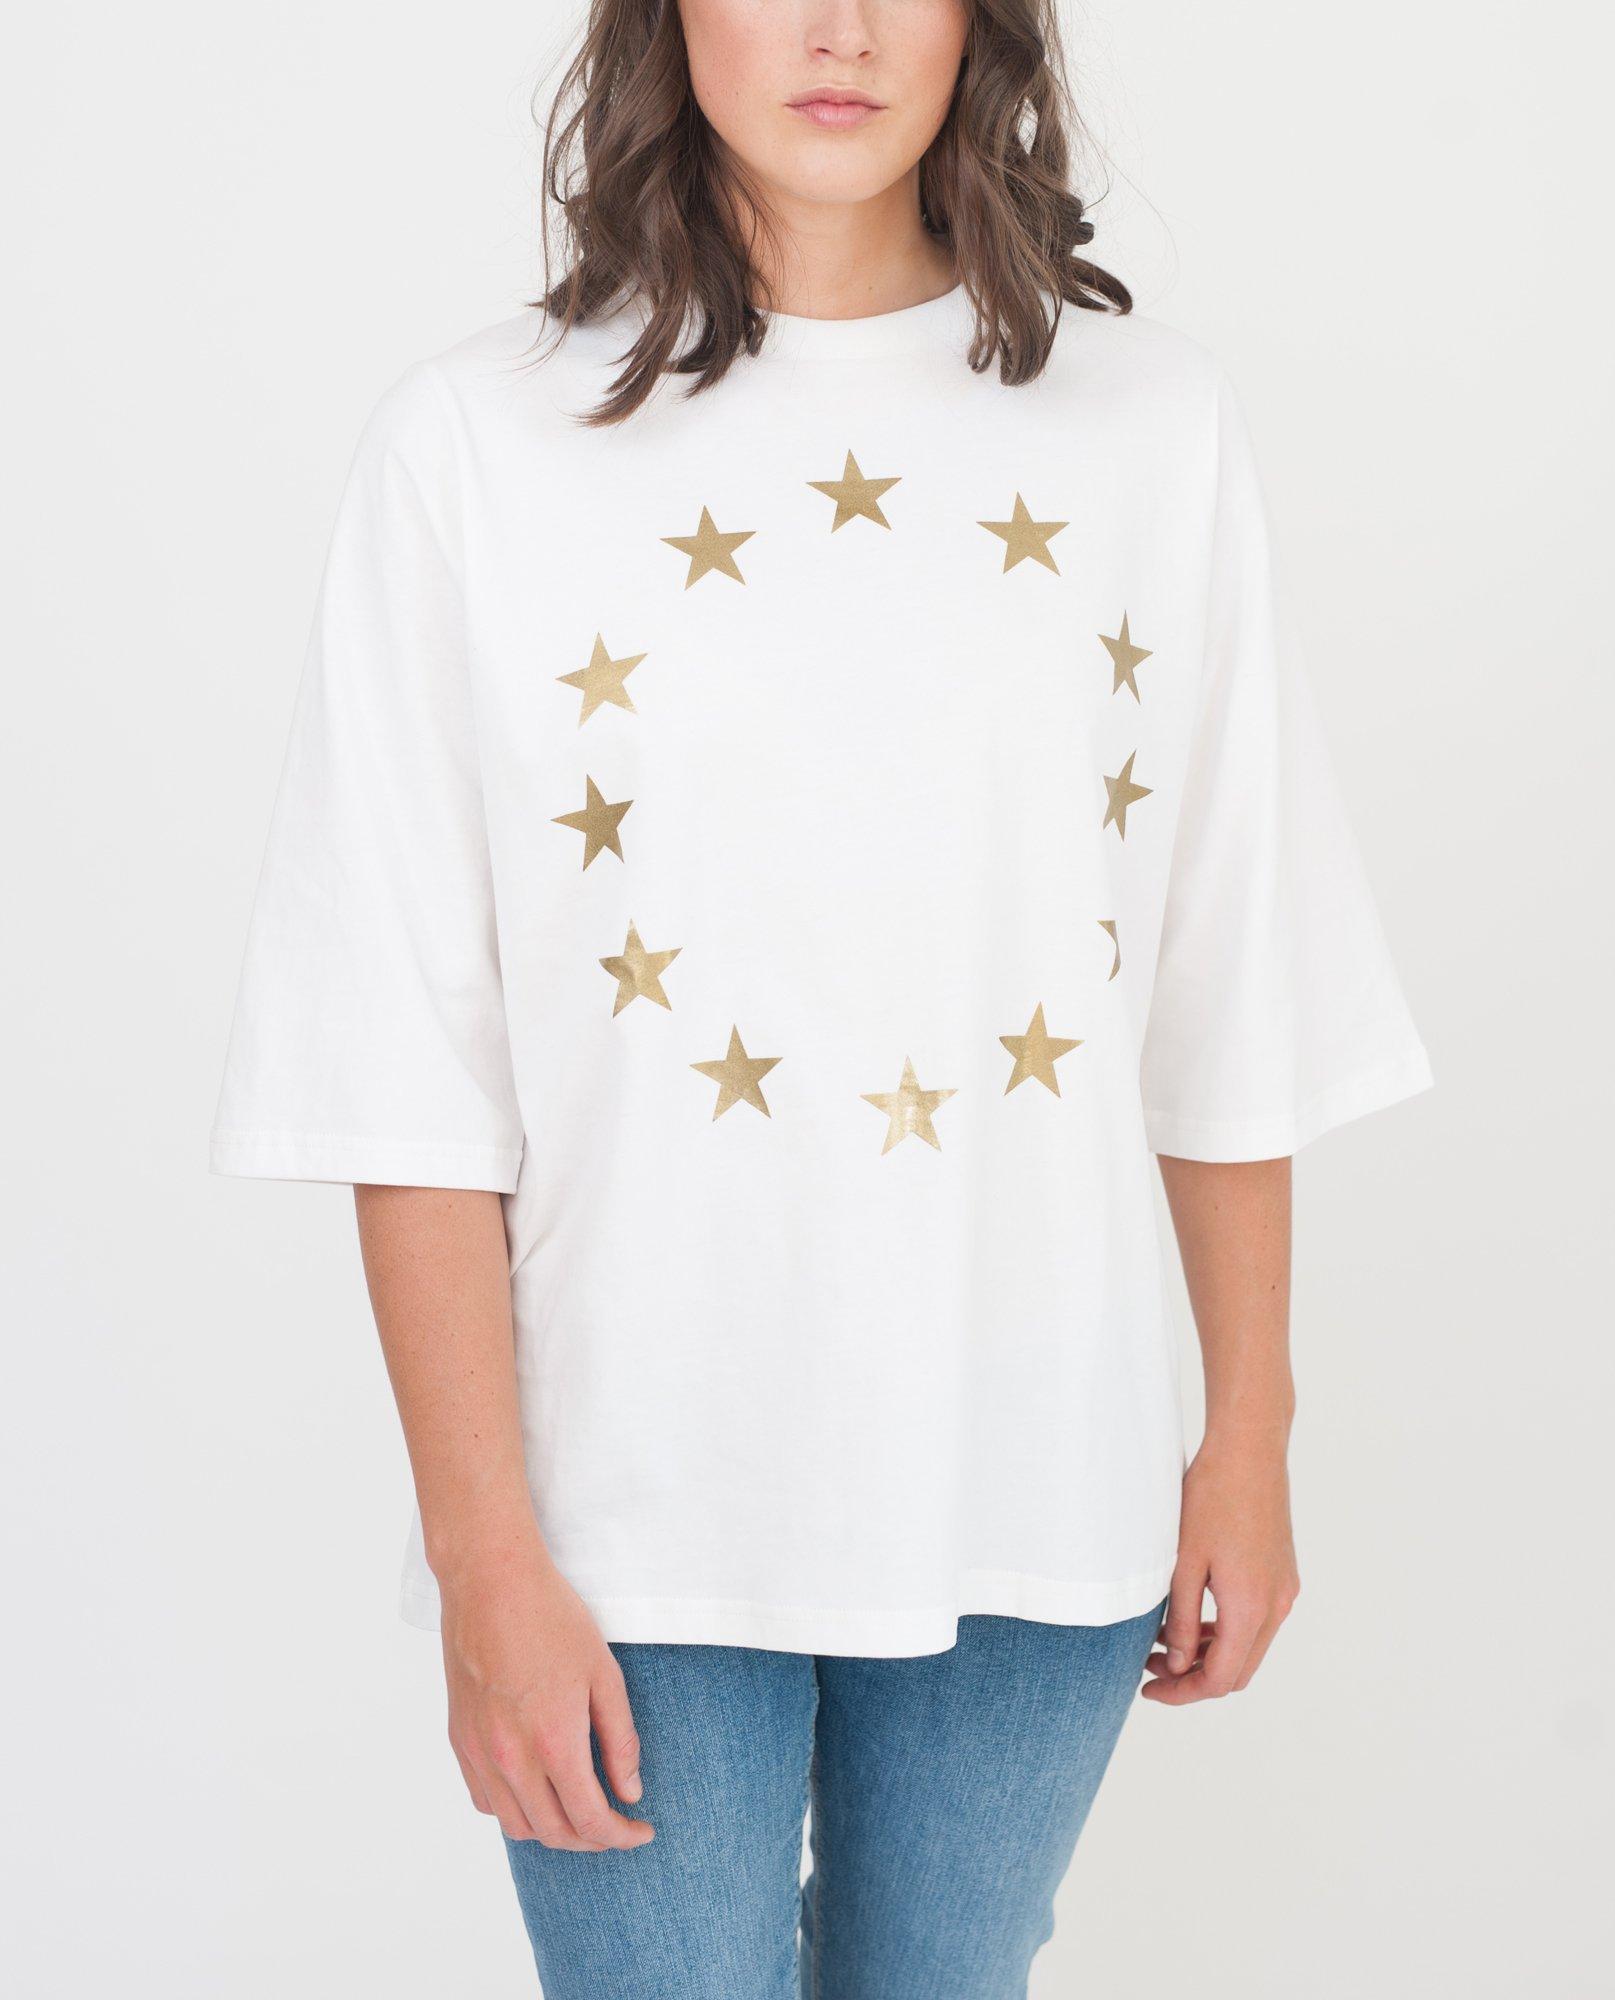 RYLAN Organic Cotton Print Tshirt from Beaumont Organic